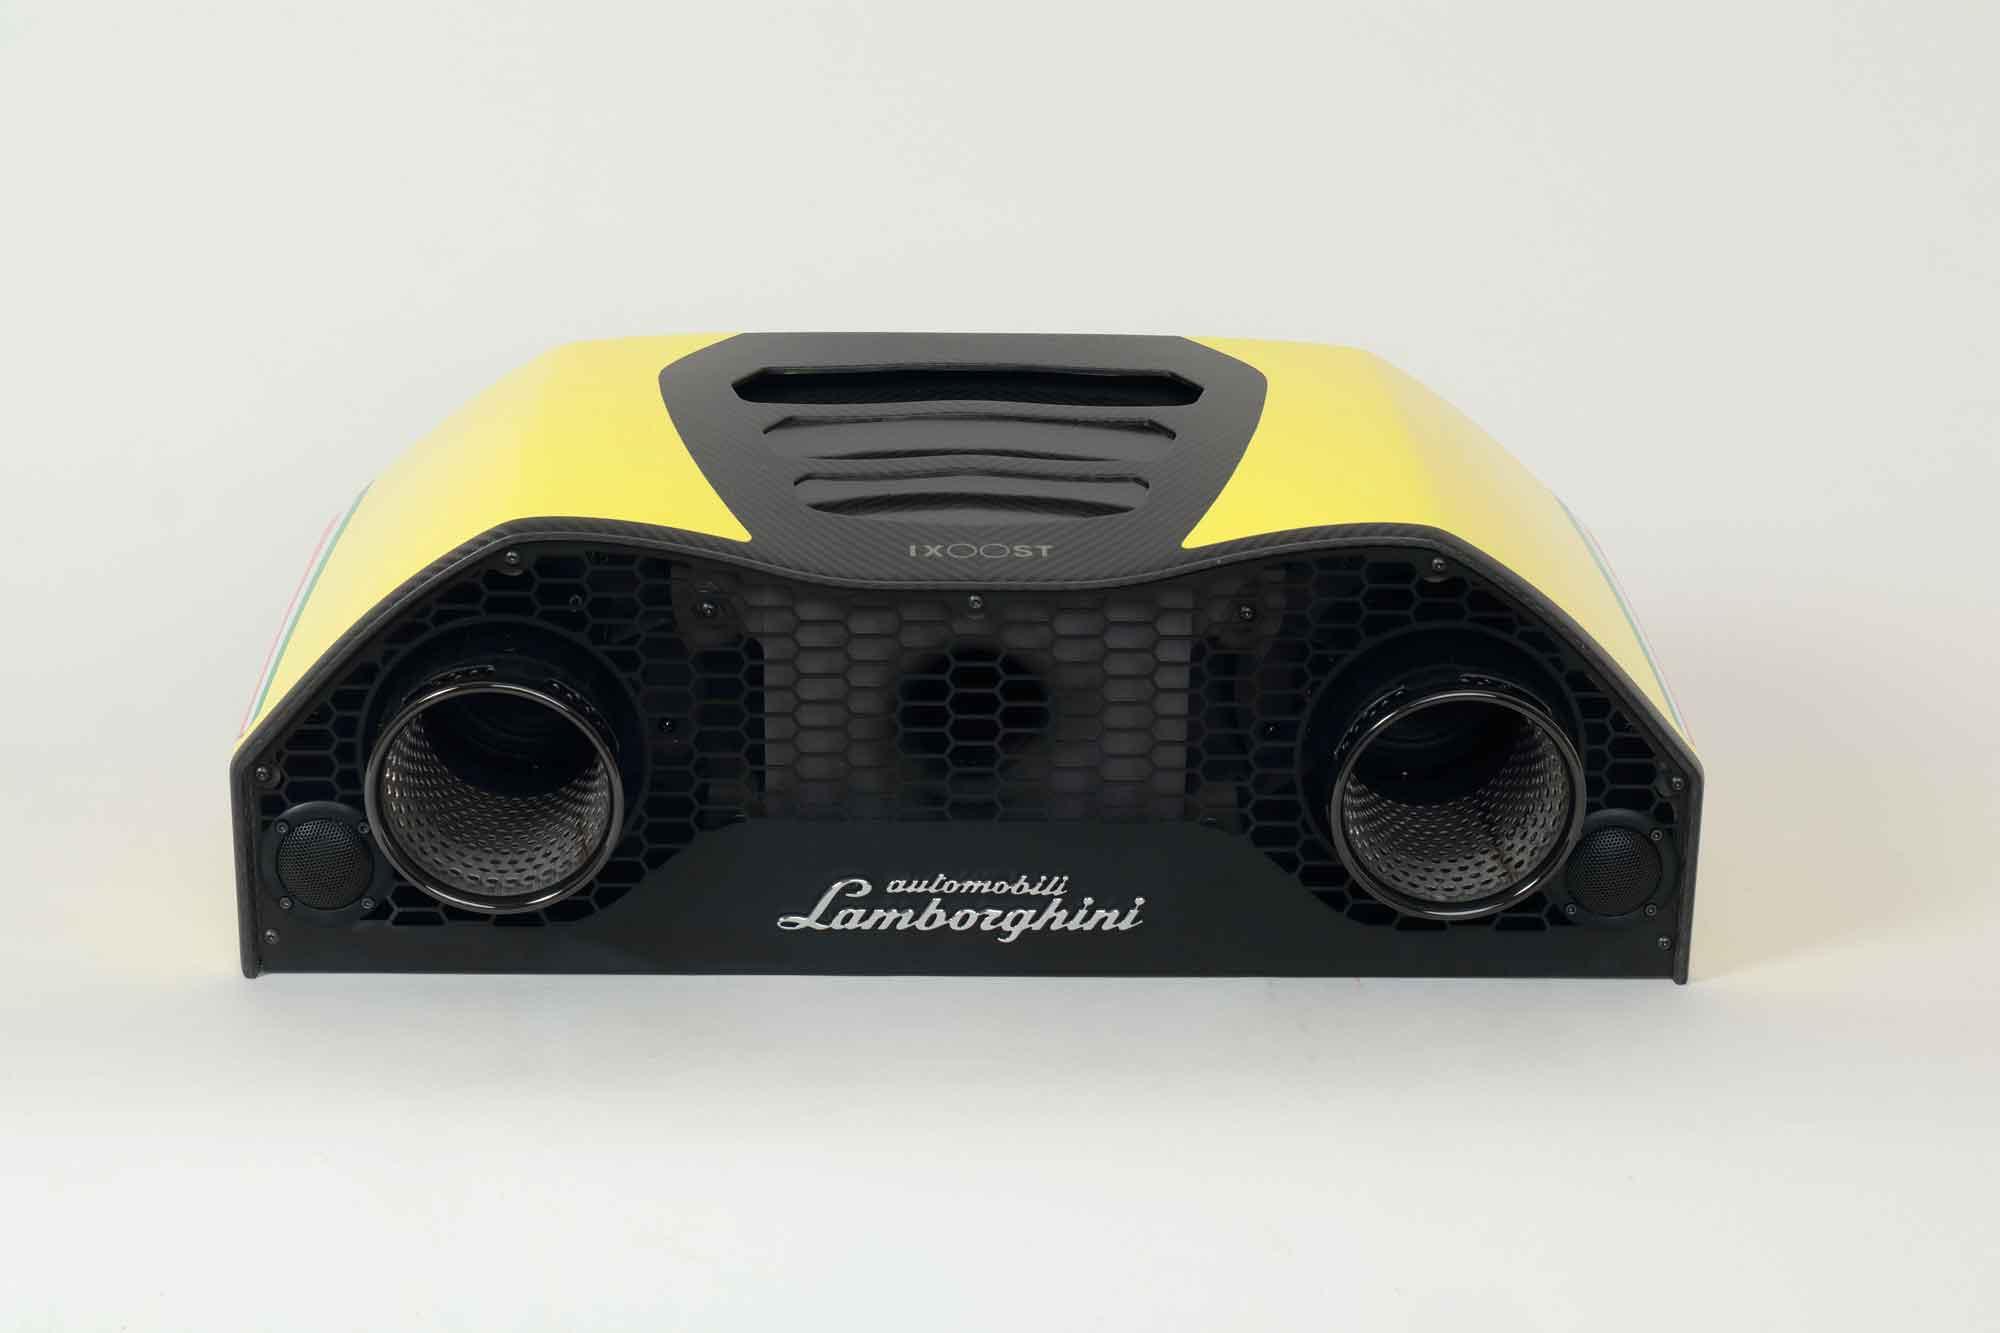 iXOOST AVALÁN Evros Yellow - Lamborghini™ stereo system